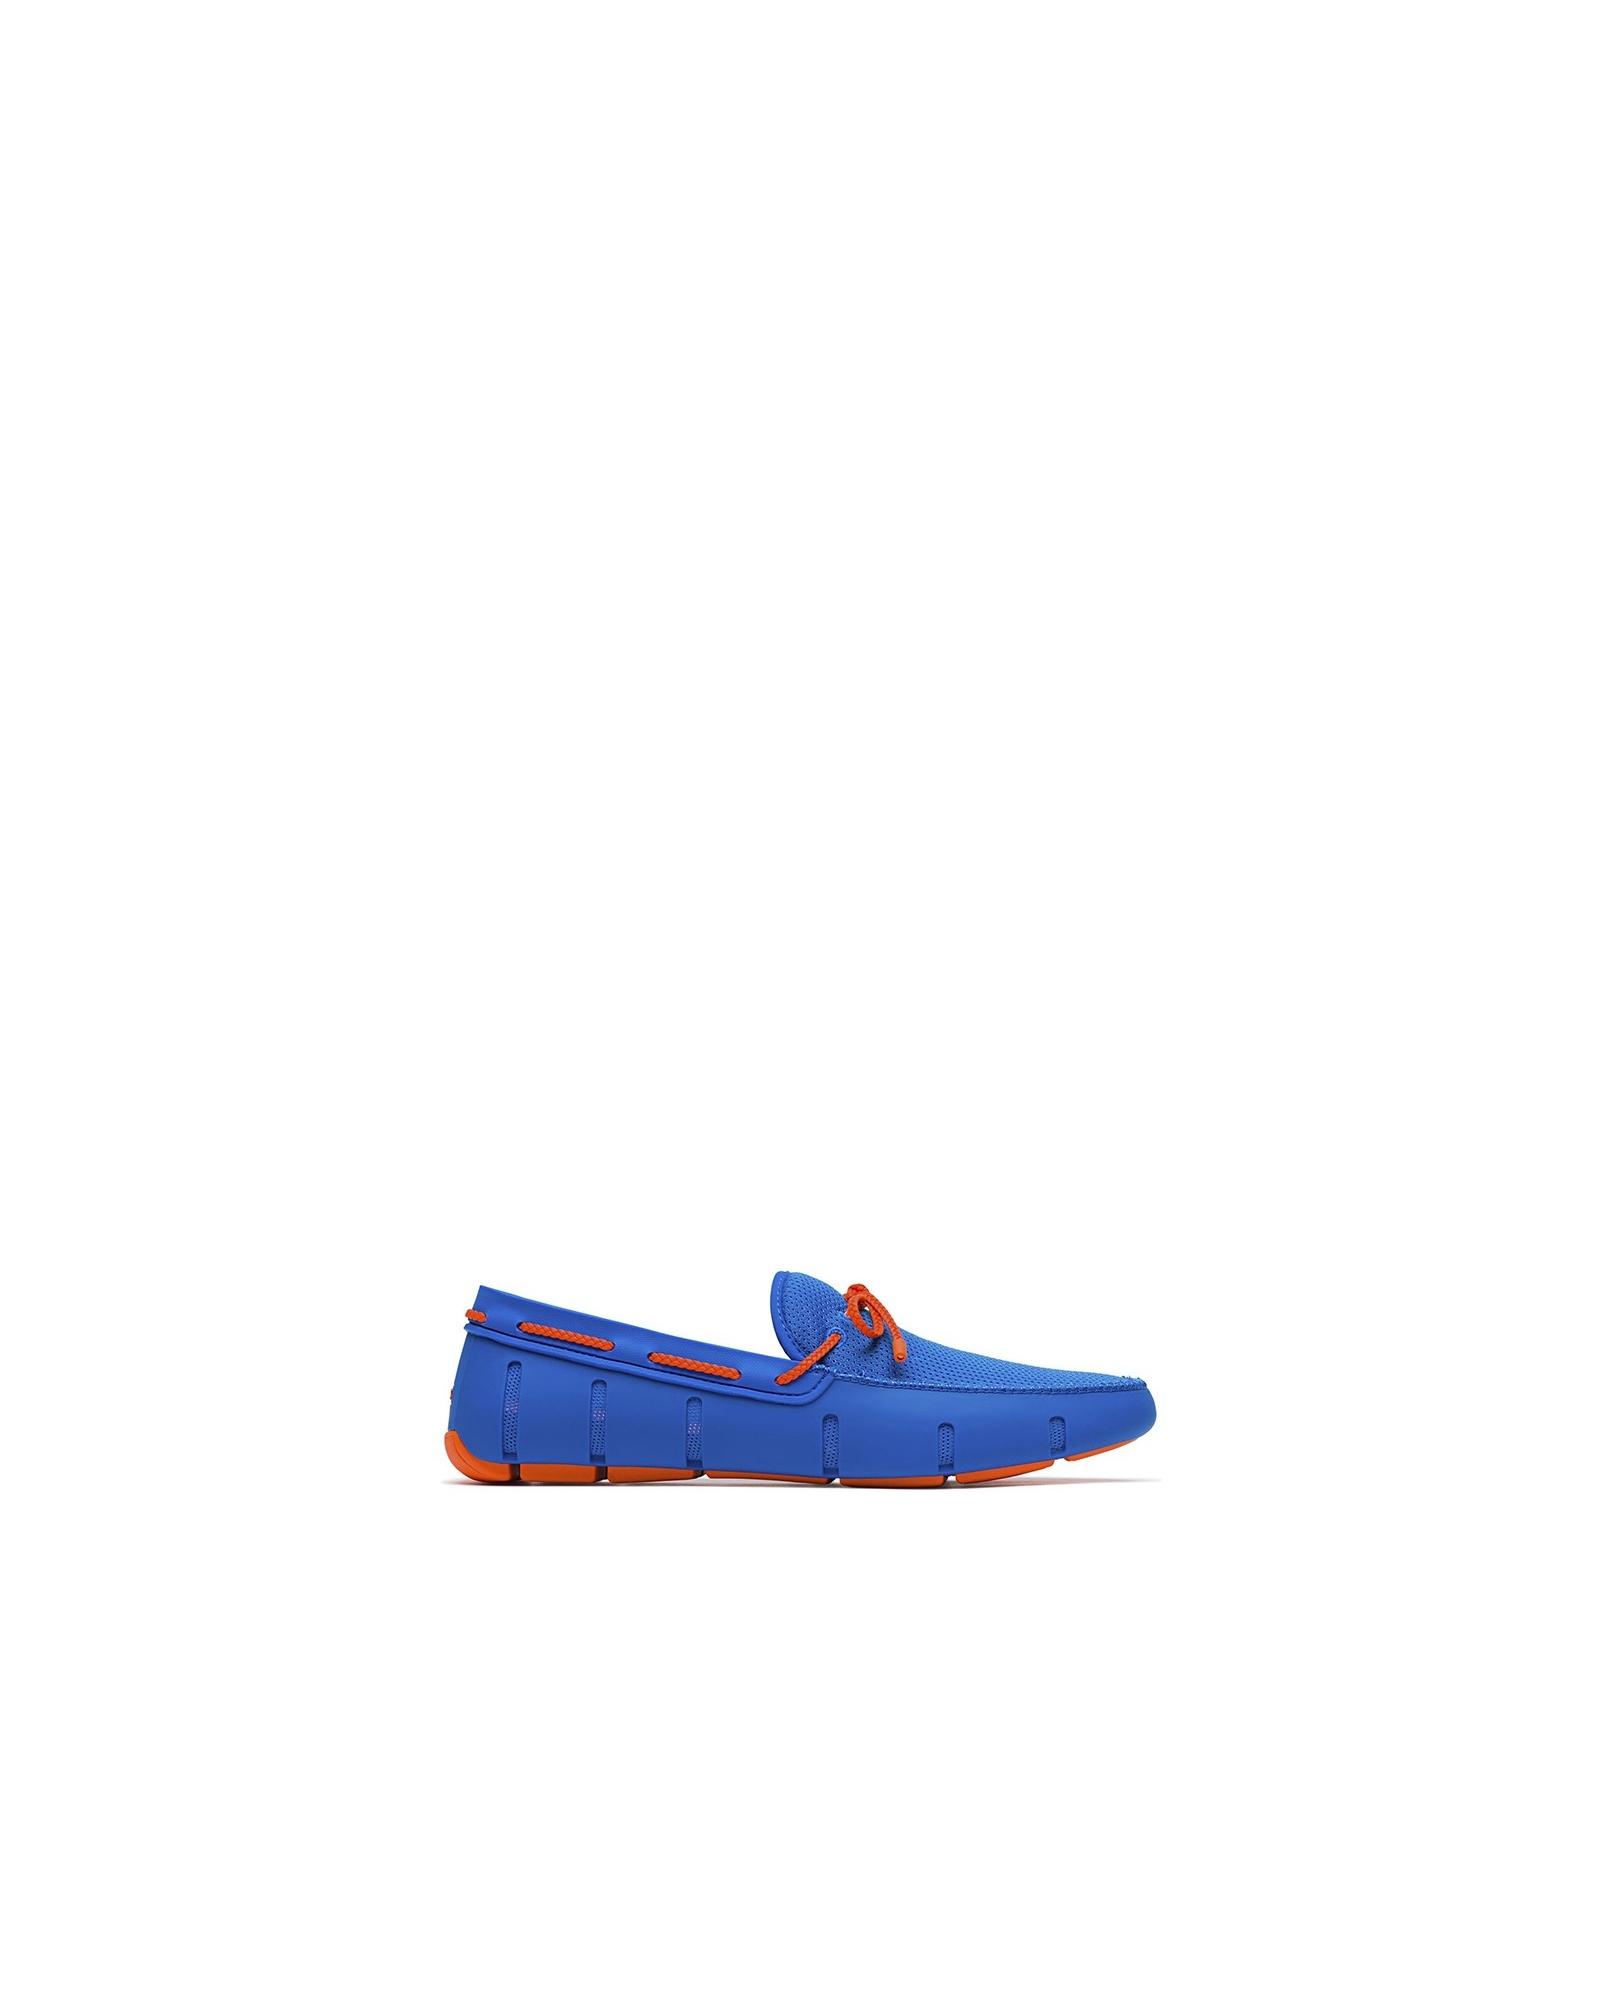 Mocassin bleu et orange Swims